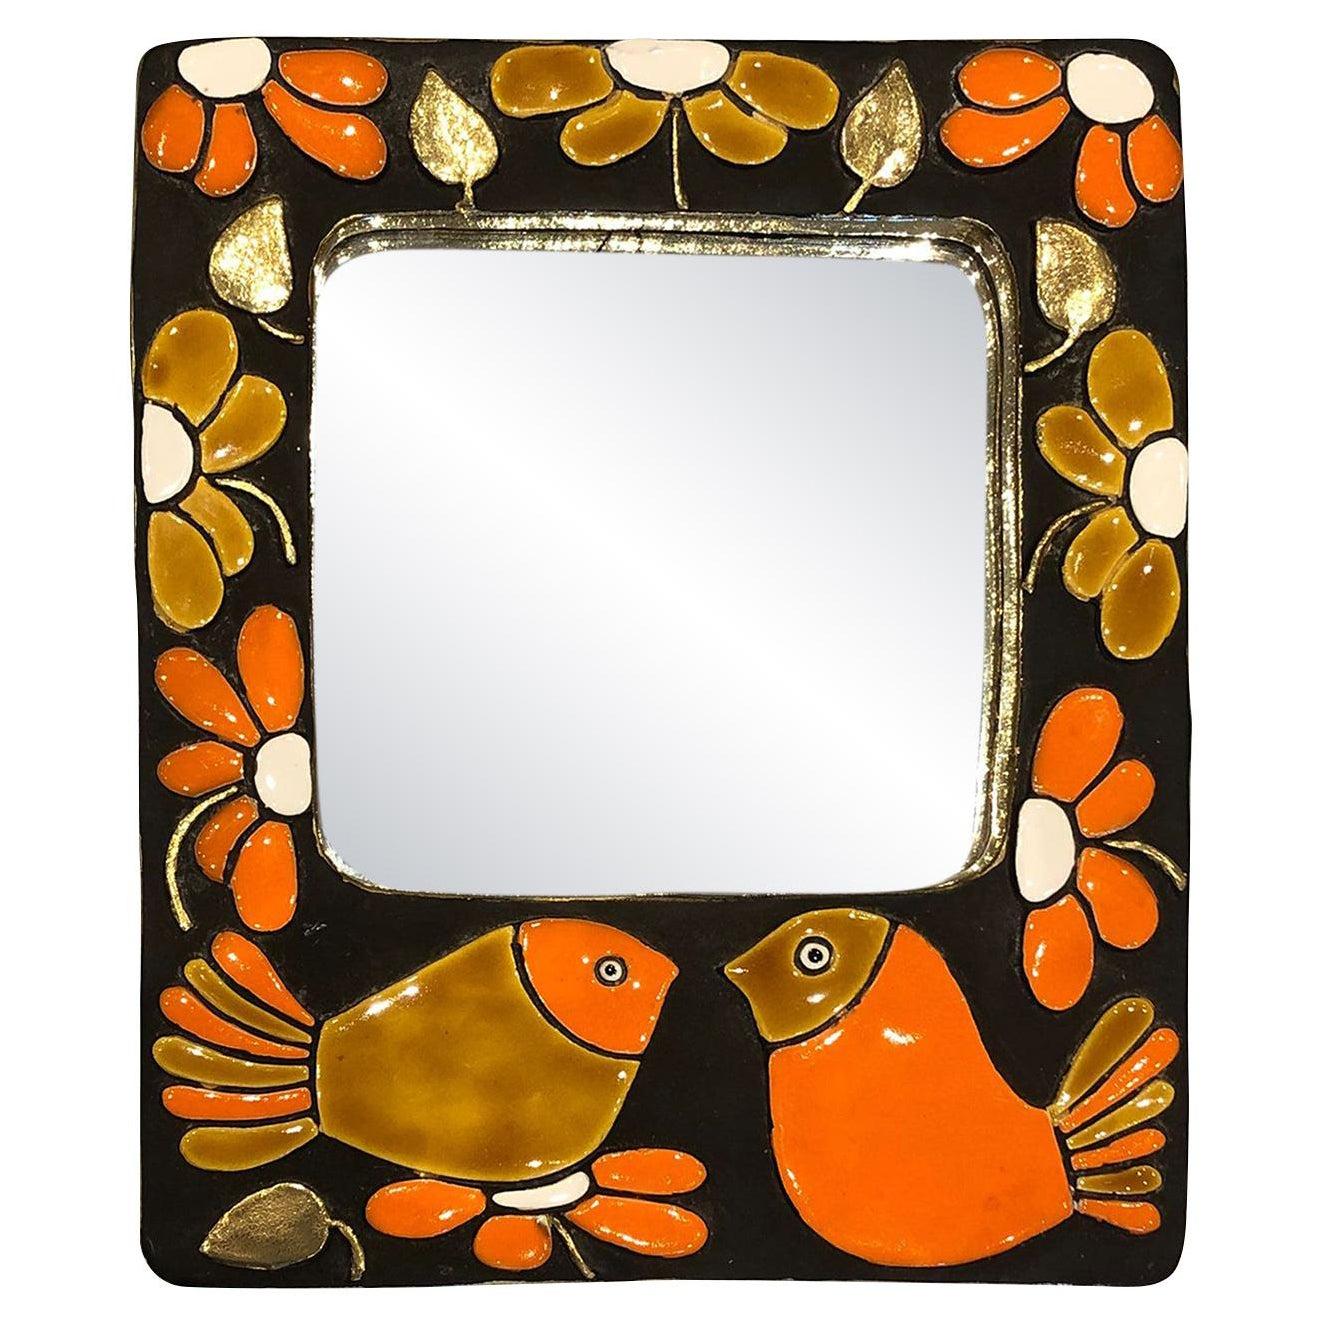 Mithé Espelt, Sparrow mirror, Ceramic, circa 1960, France